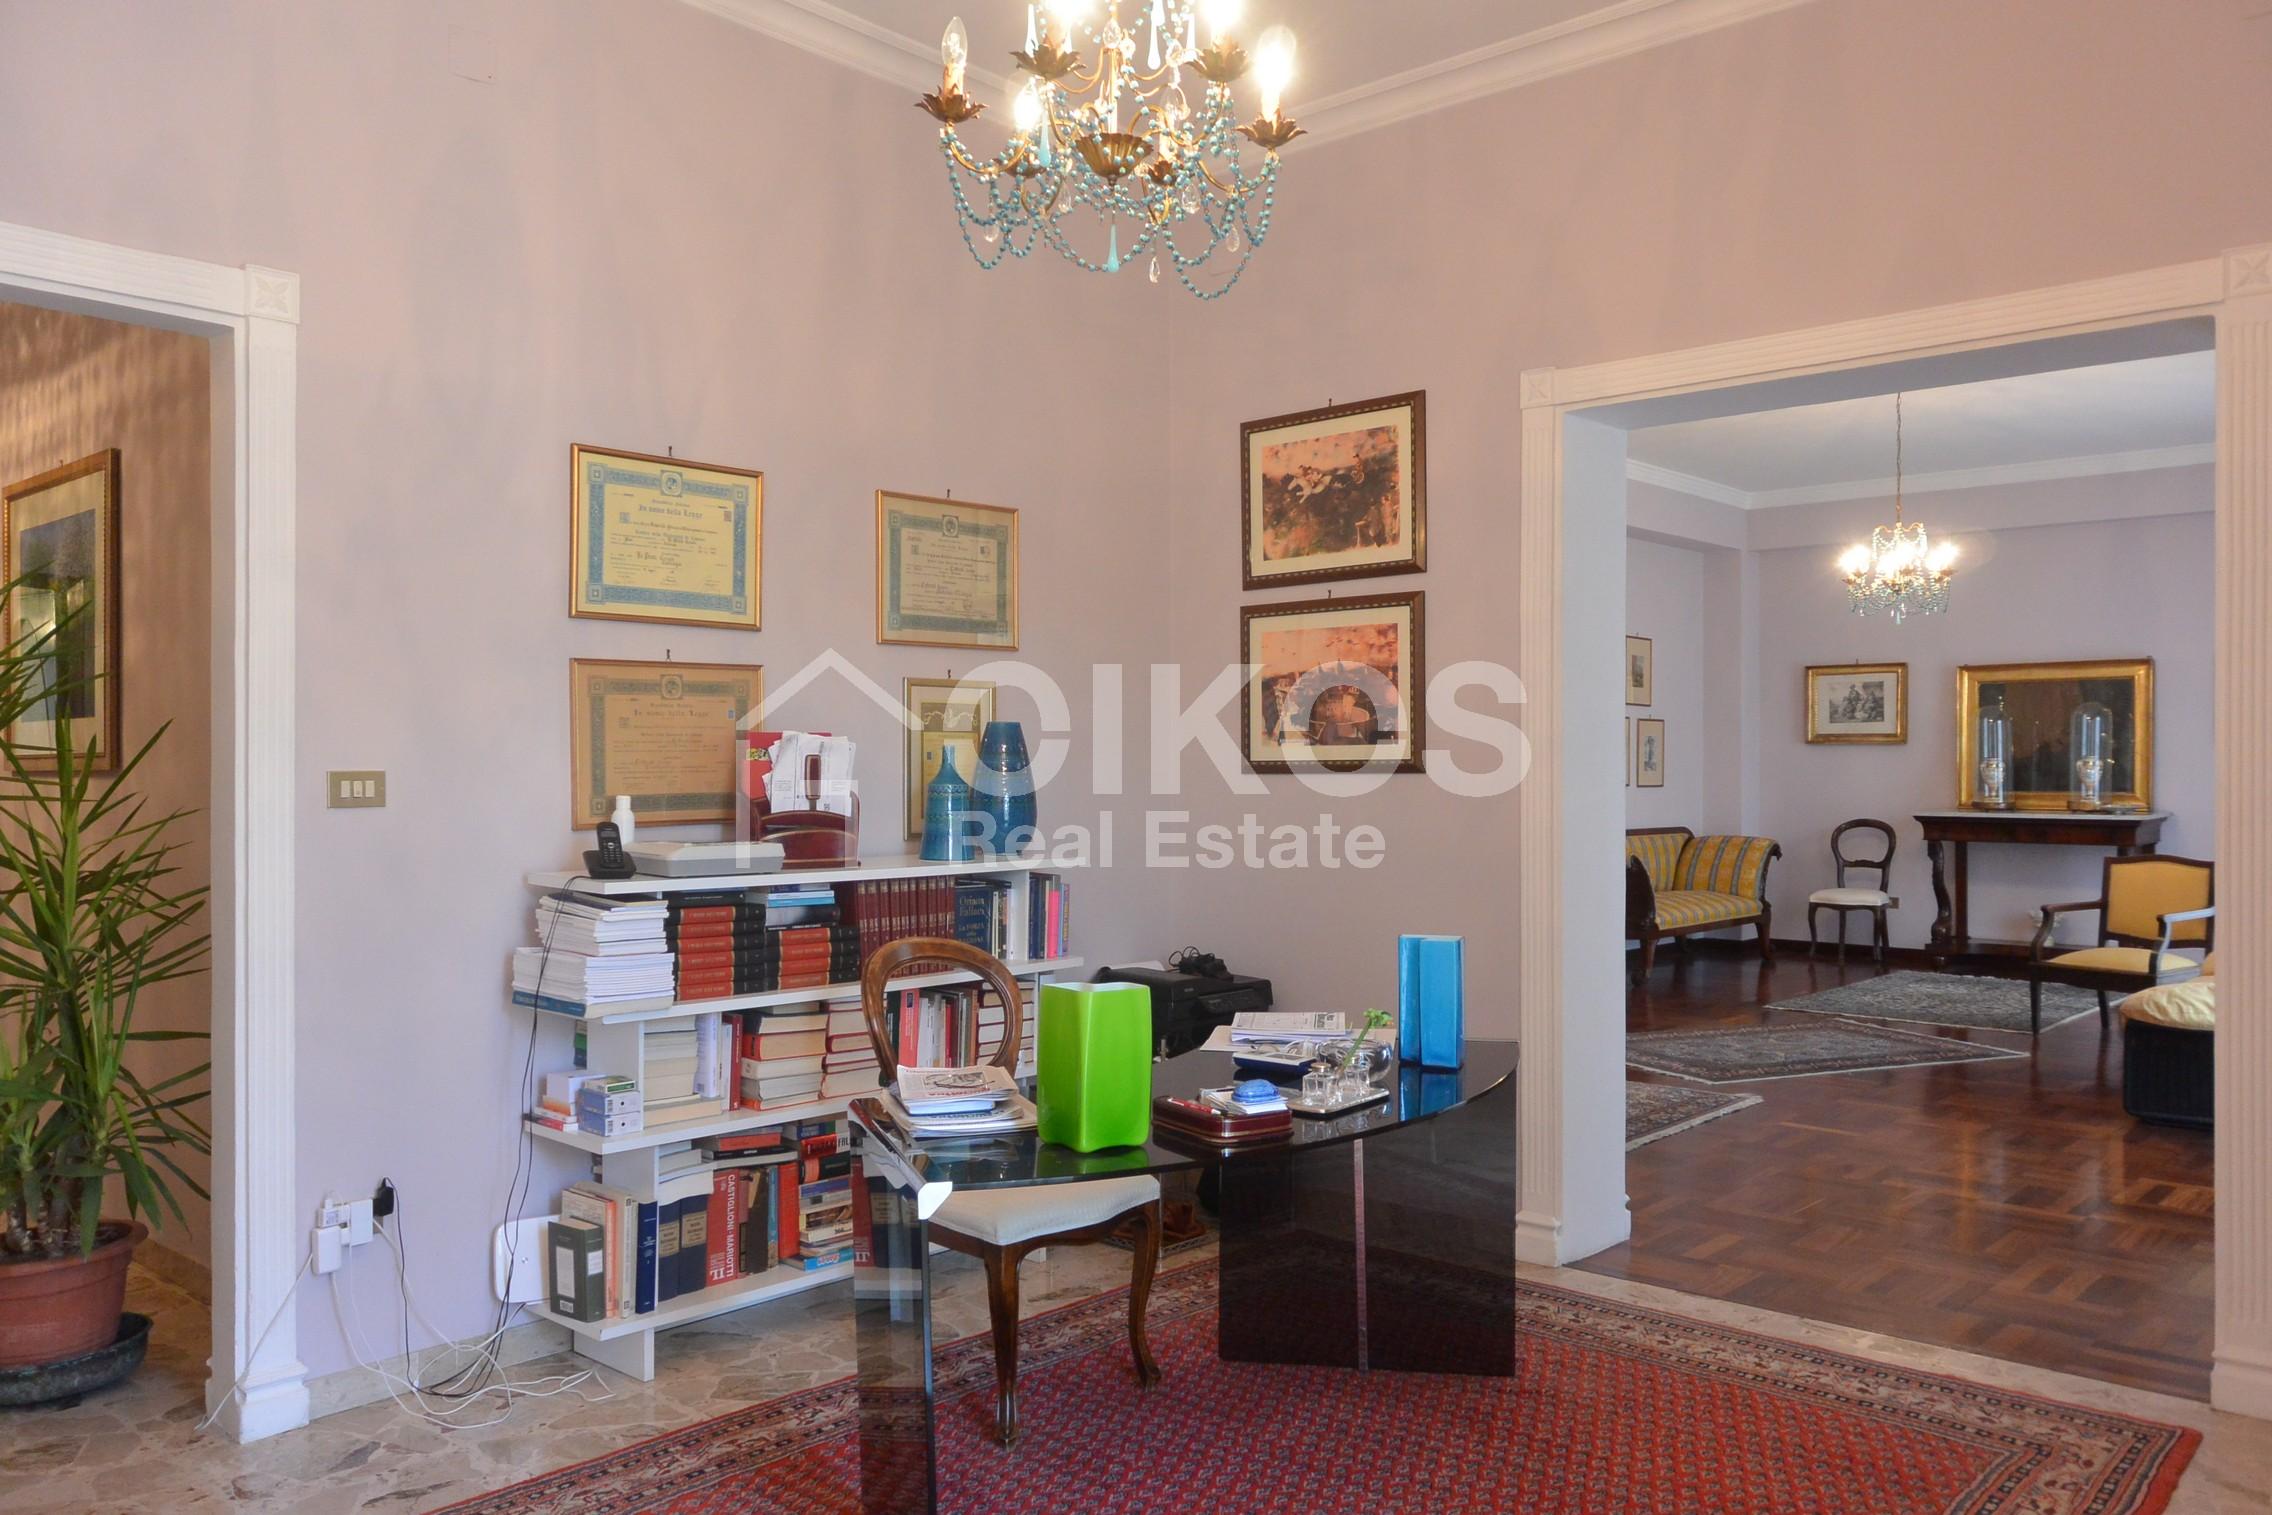 Appartamento con garage in via Vespucci 01